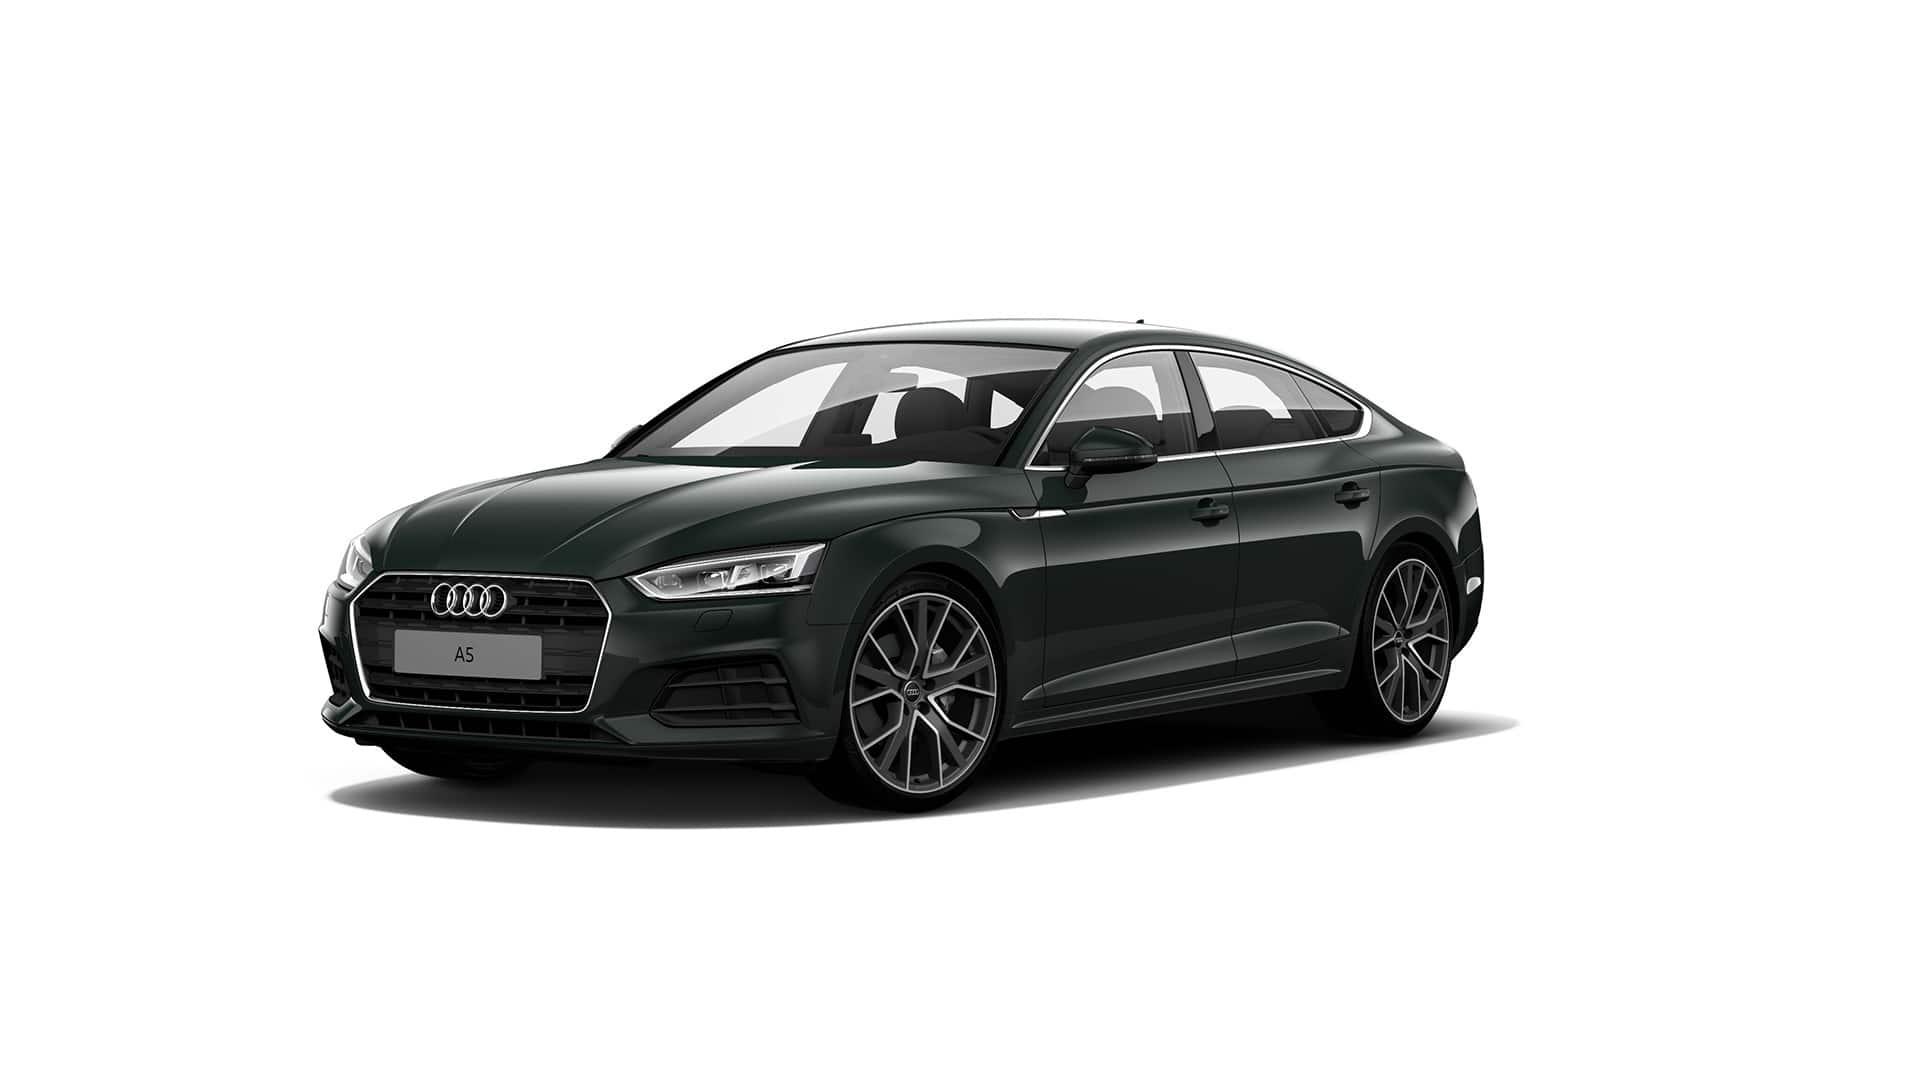 Sonderrabatt Turnschuhe tolle Passform Exterieur > Audi exclusive > Audi Deutschland